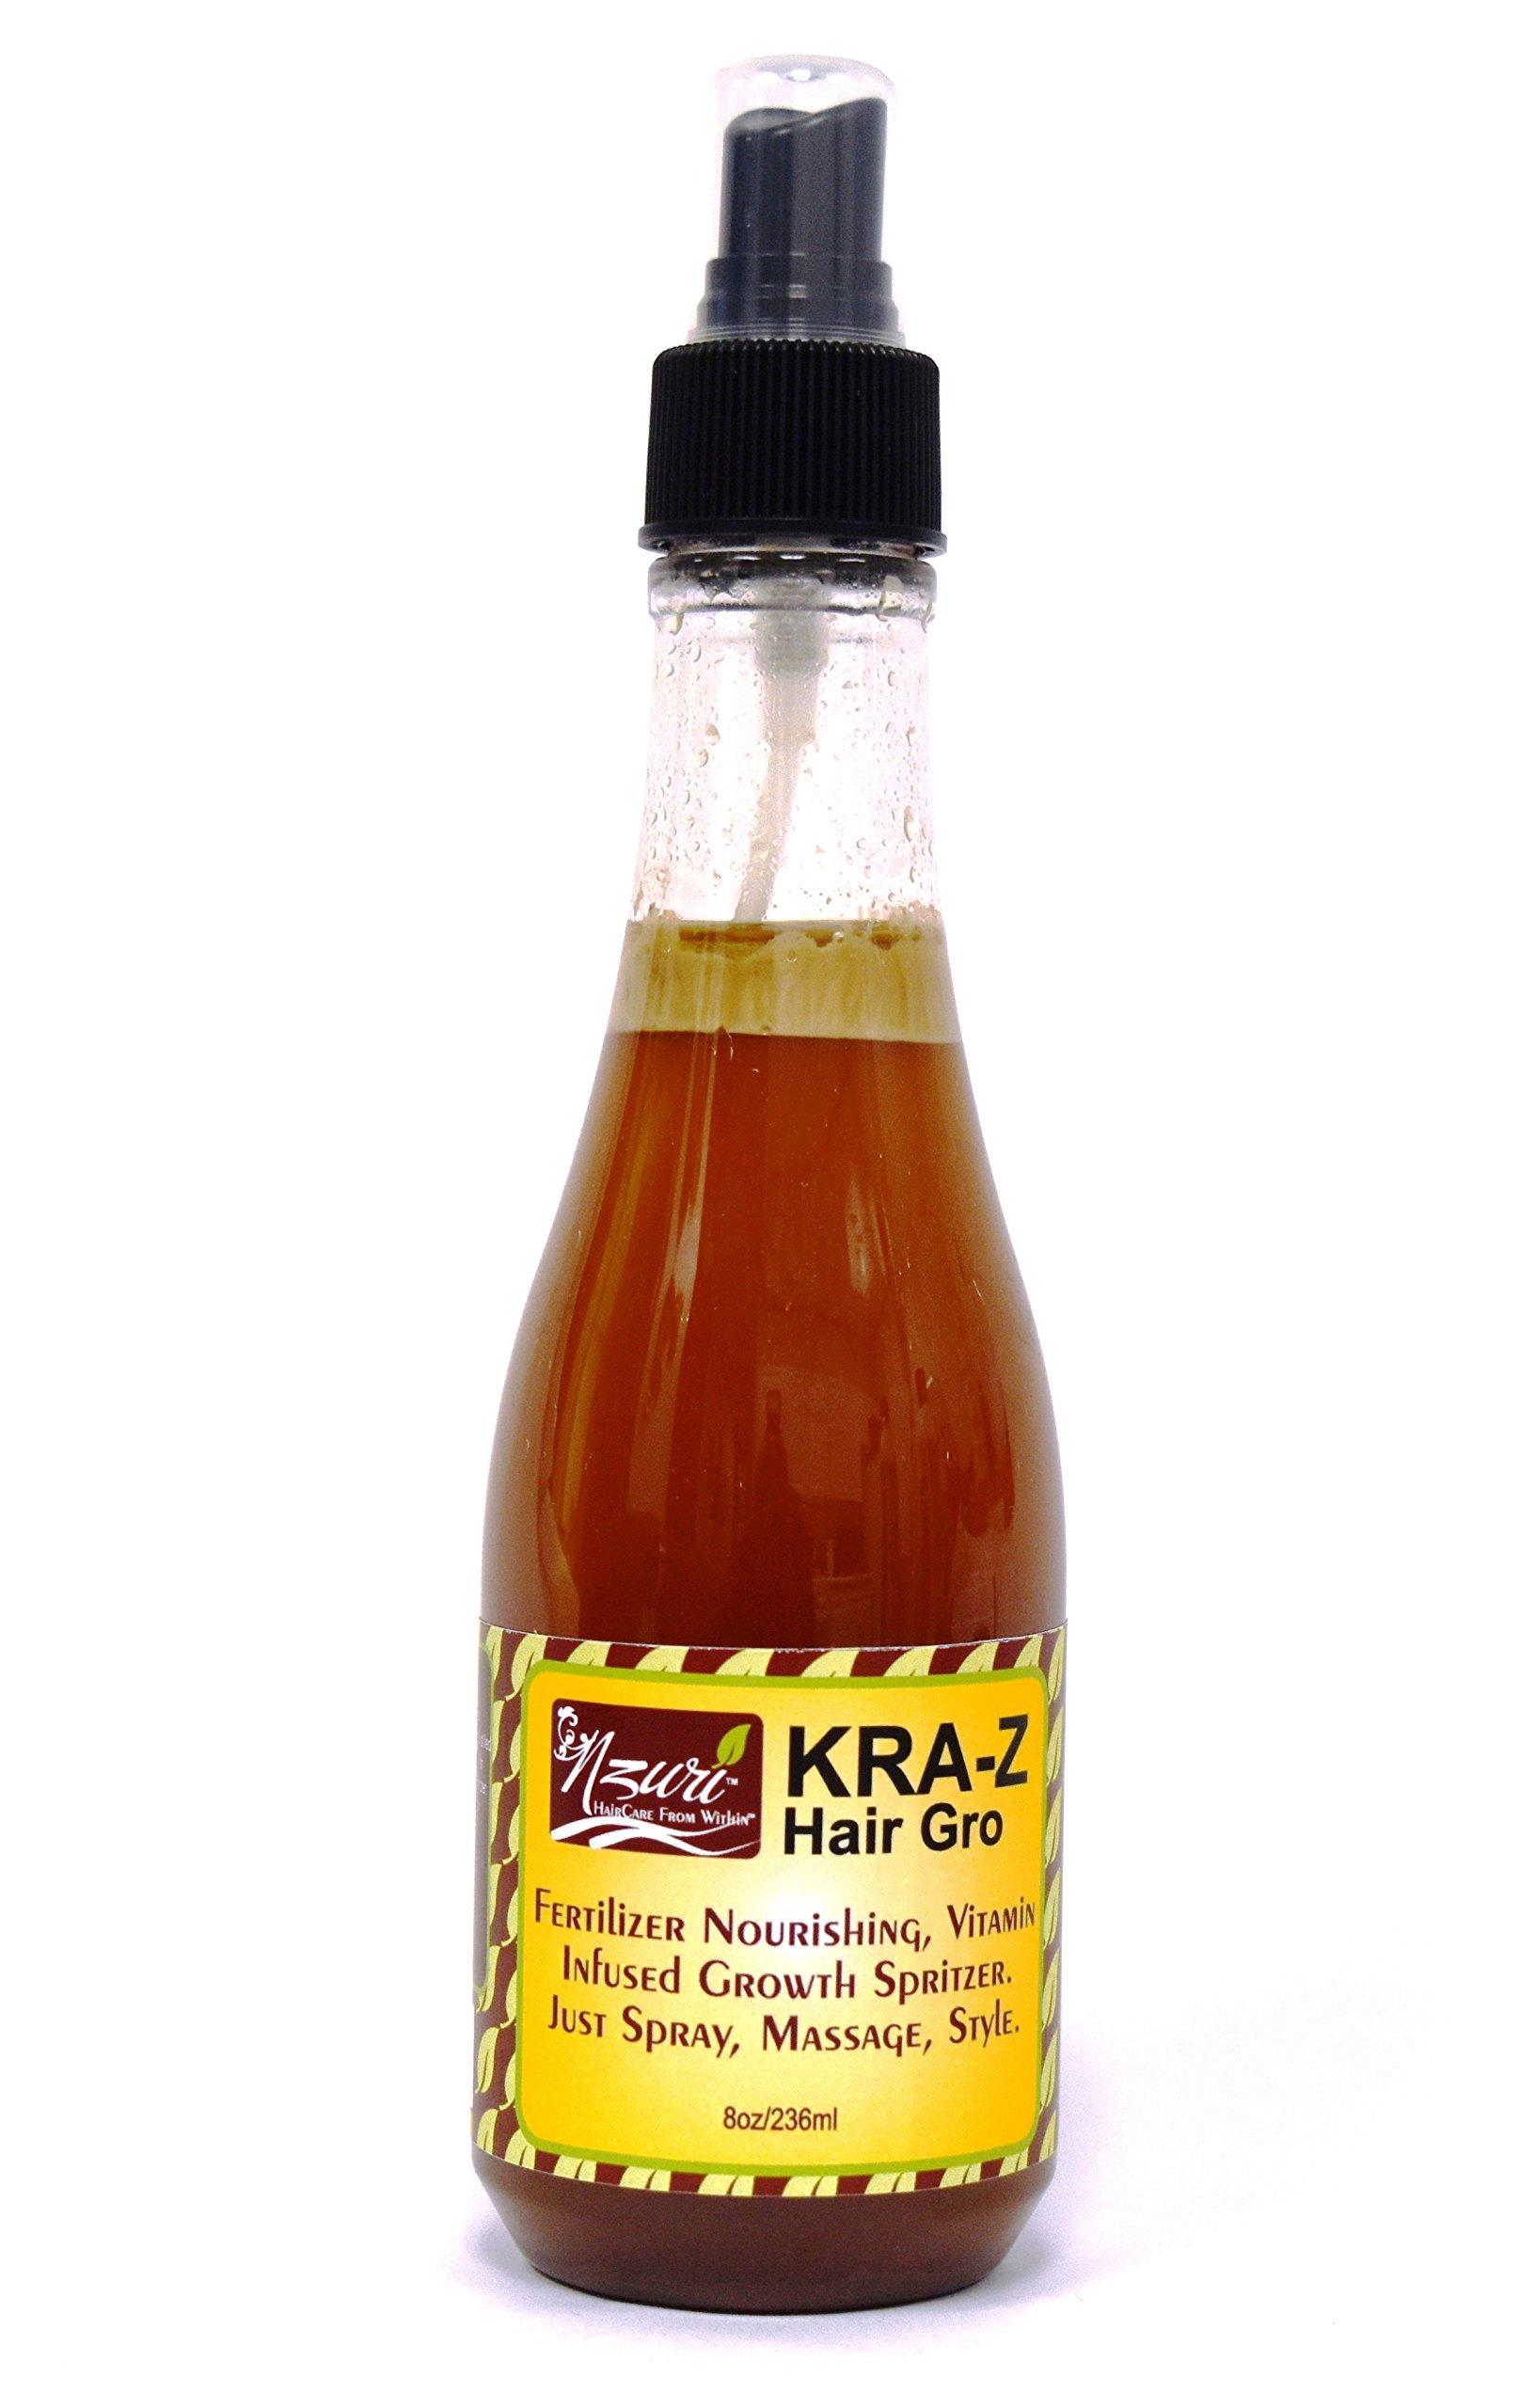 Nzuri Kra-z Hair Gro Fertilizer Nourishing, Vitamin Infused Growth Spritzer 8oz